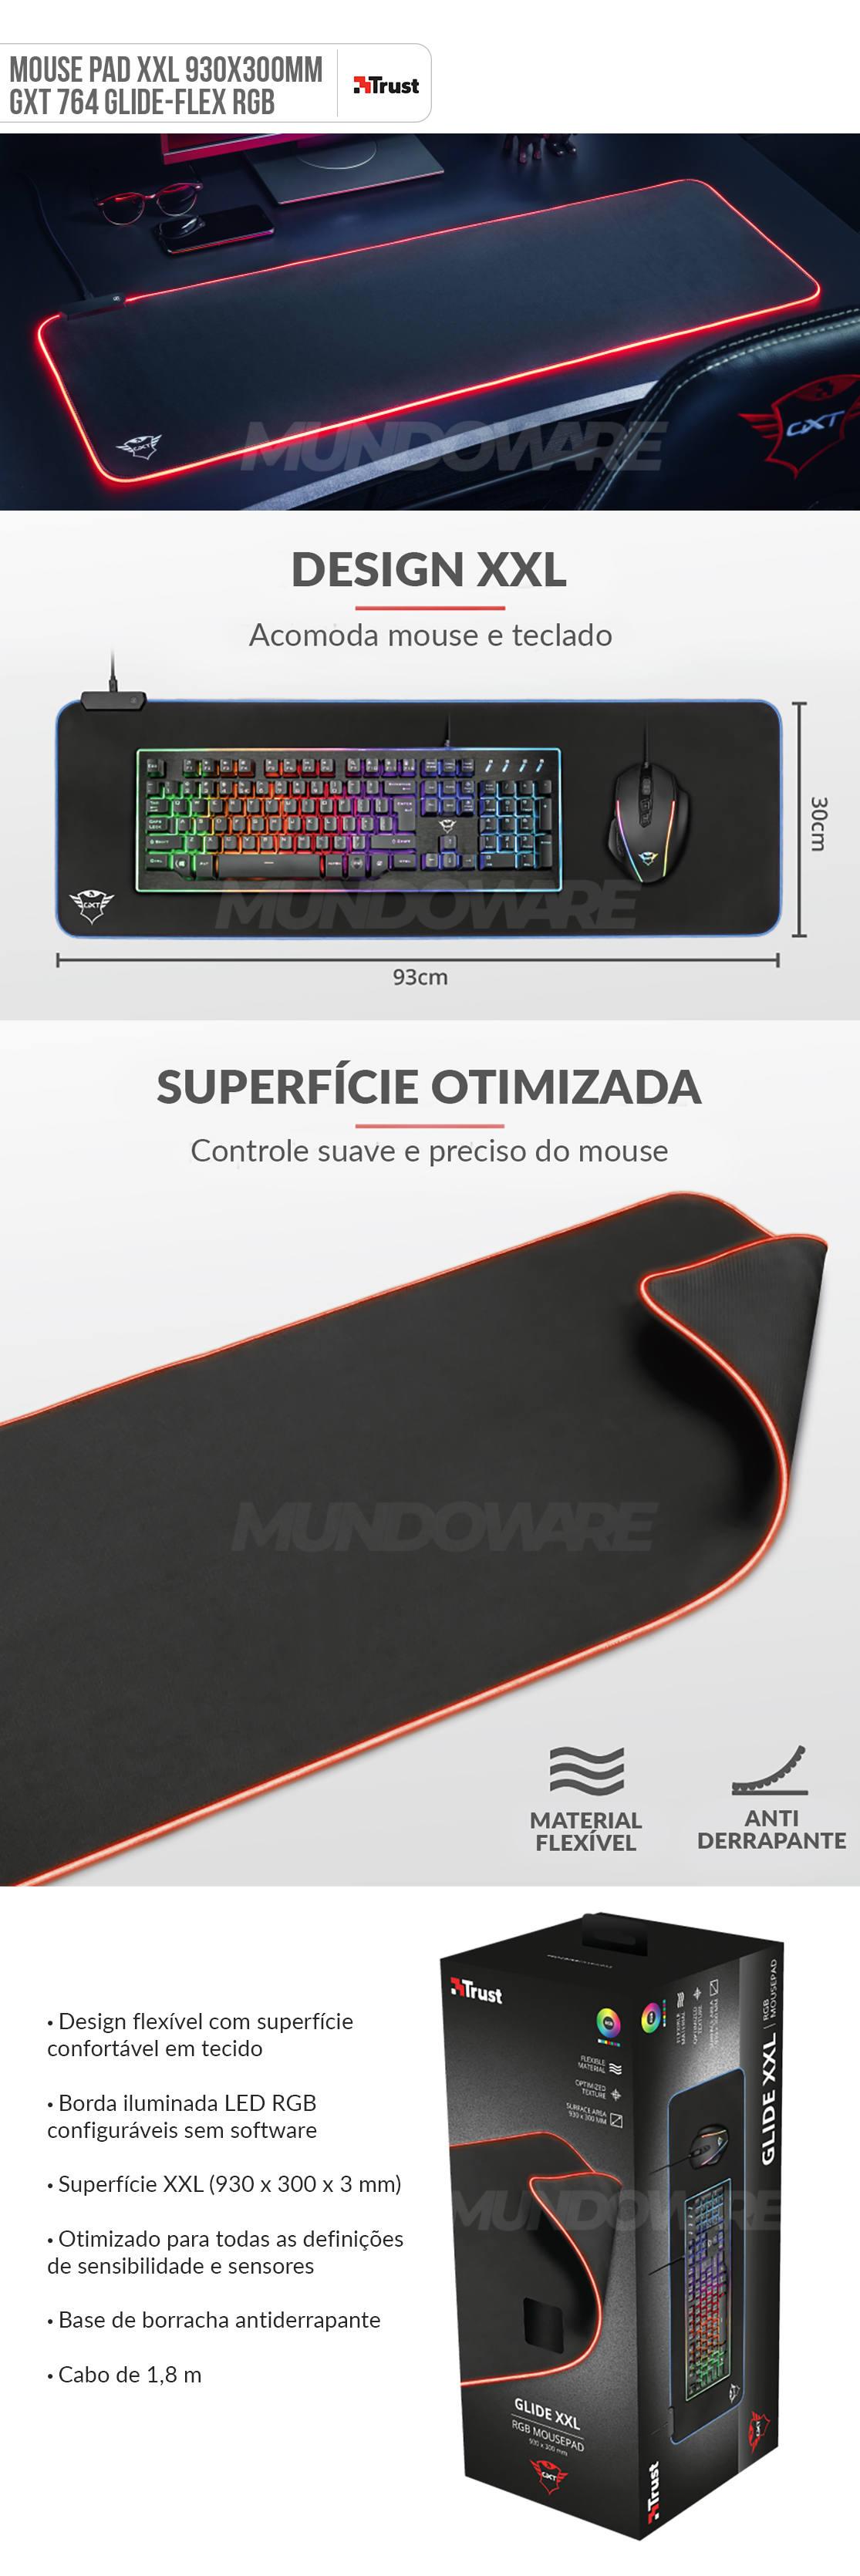 Mousepad Gamer XXL 930 x 300 x 3 mm com Iluminação RGB e Textura otimizada GXT 764 Glide Flex RGB Mouse Pad Preto